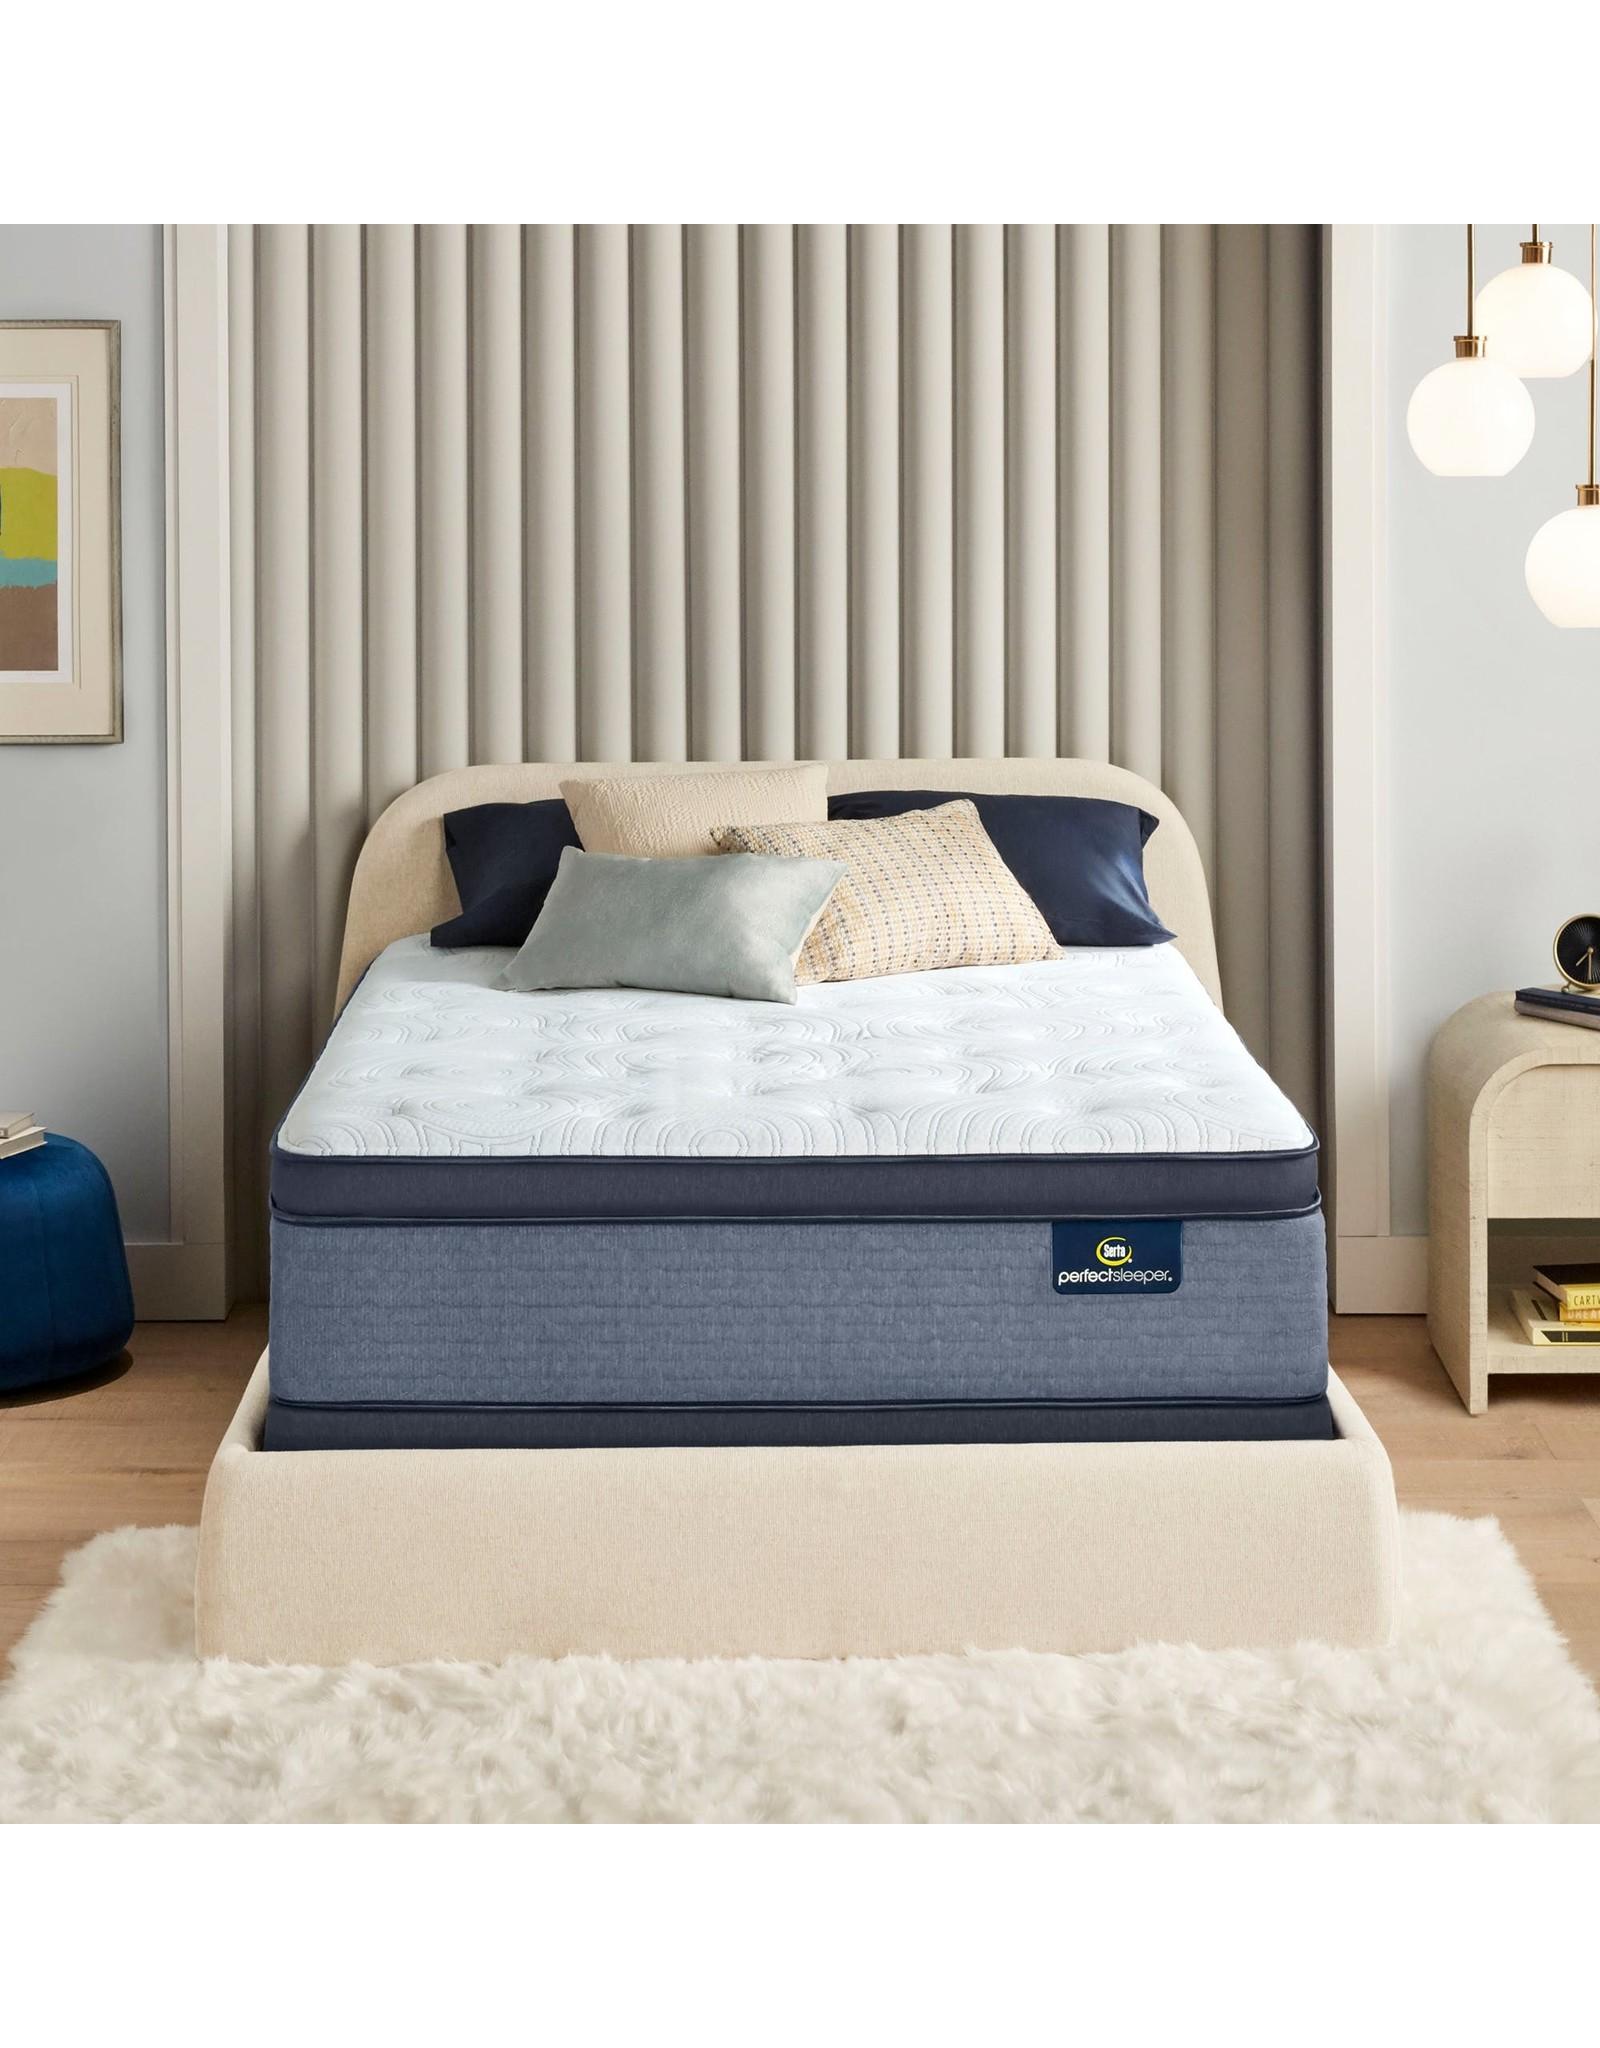 Renewed Night Renewed Night Firm Pillow Top Queen Mattress